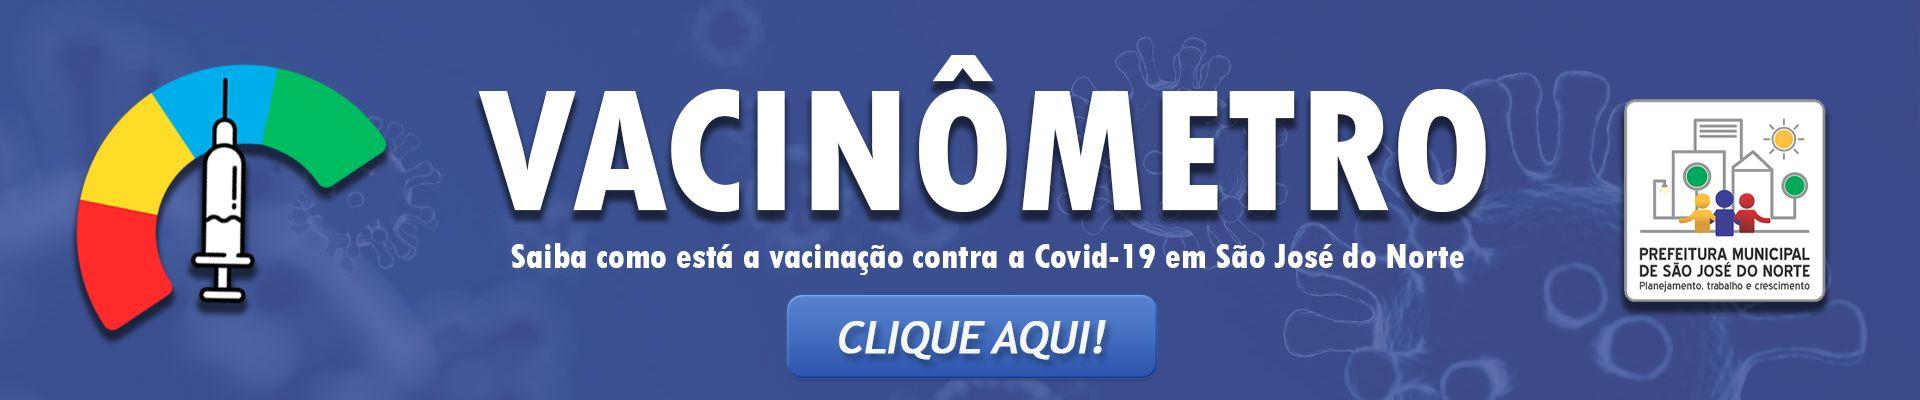 Banner 4 - VACINÔMETRO